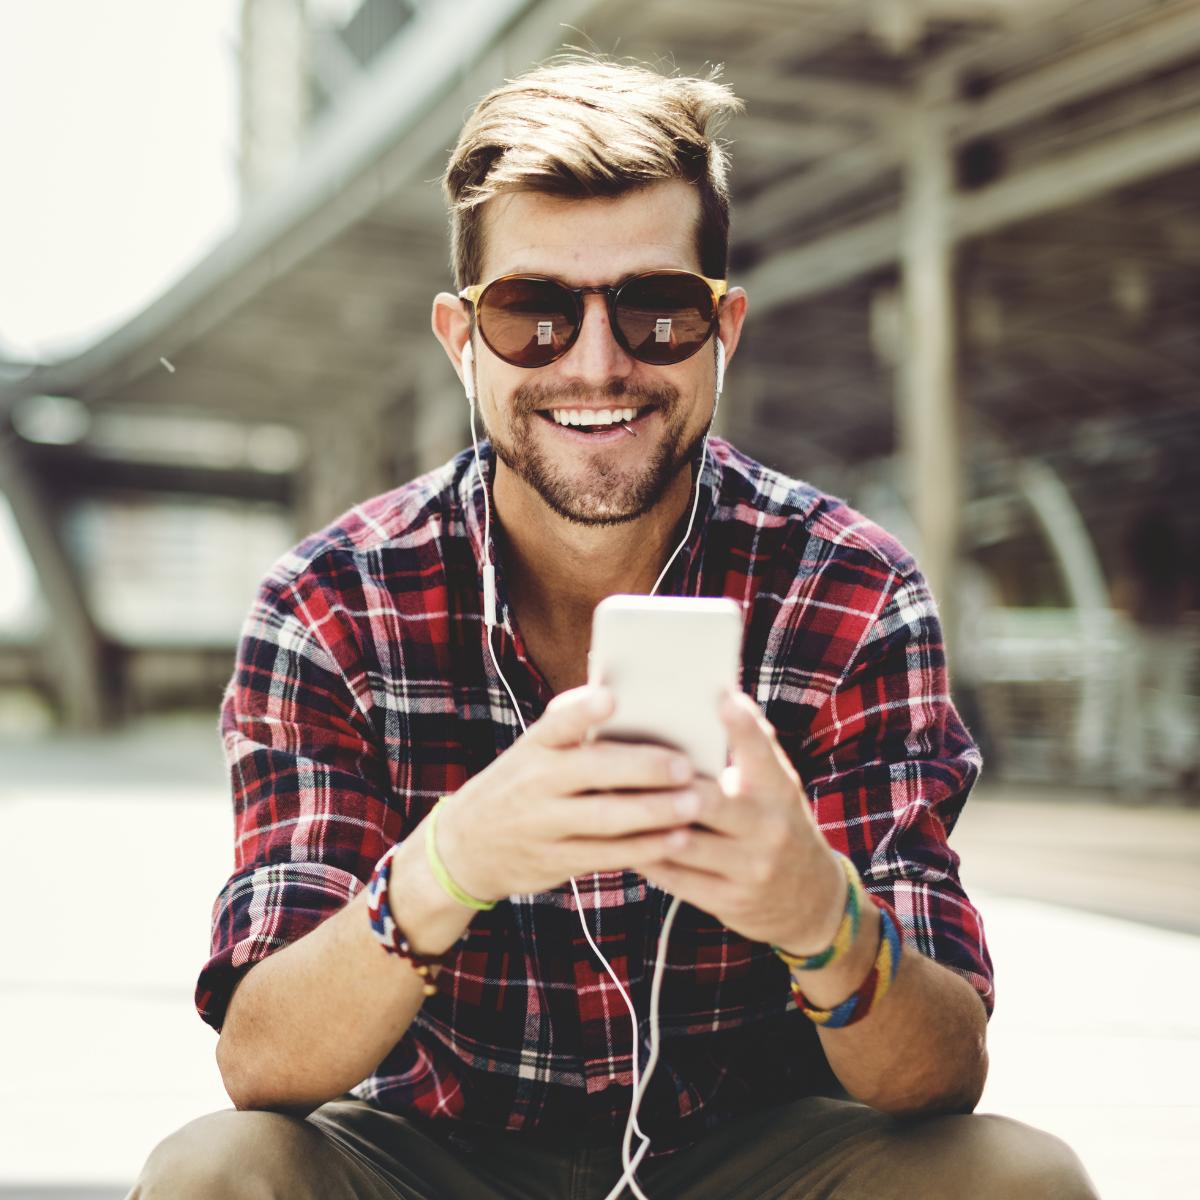 Facebook bietet bald Podcasts an - Spotify macht Live-Audio